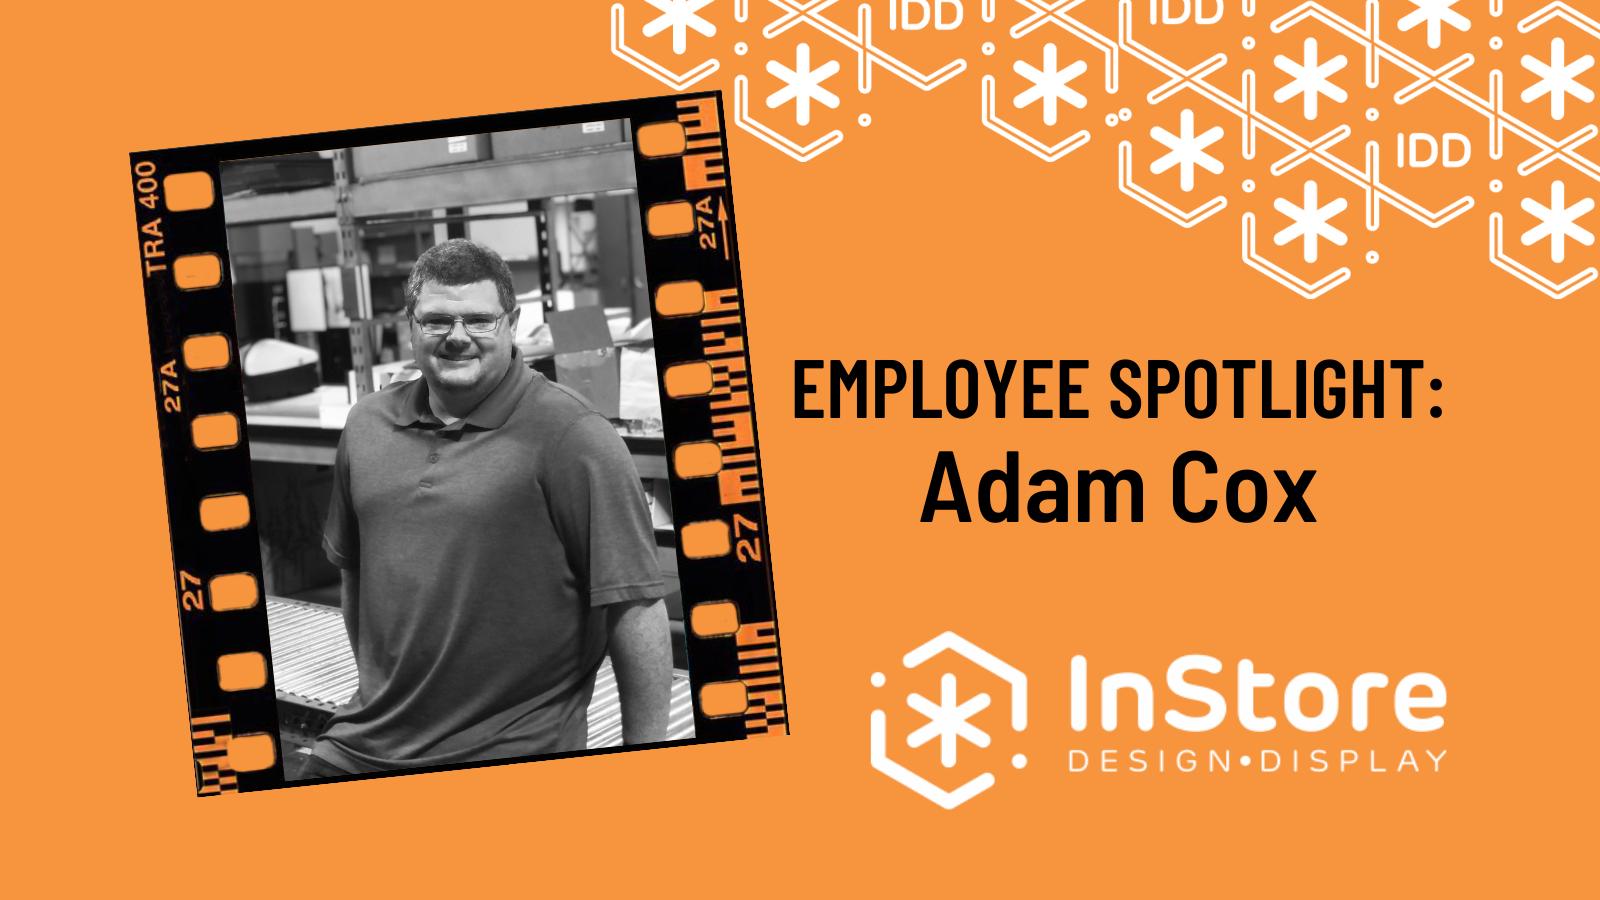 IDD Team Member Spotlight: Adam Cox